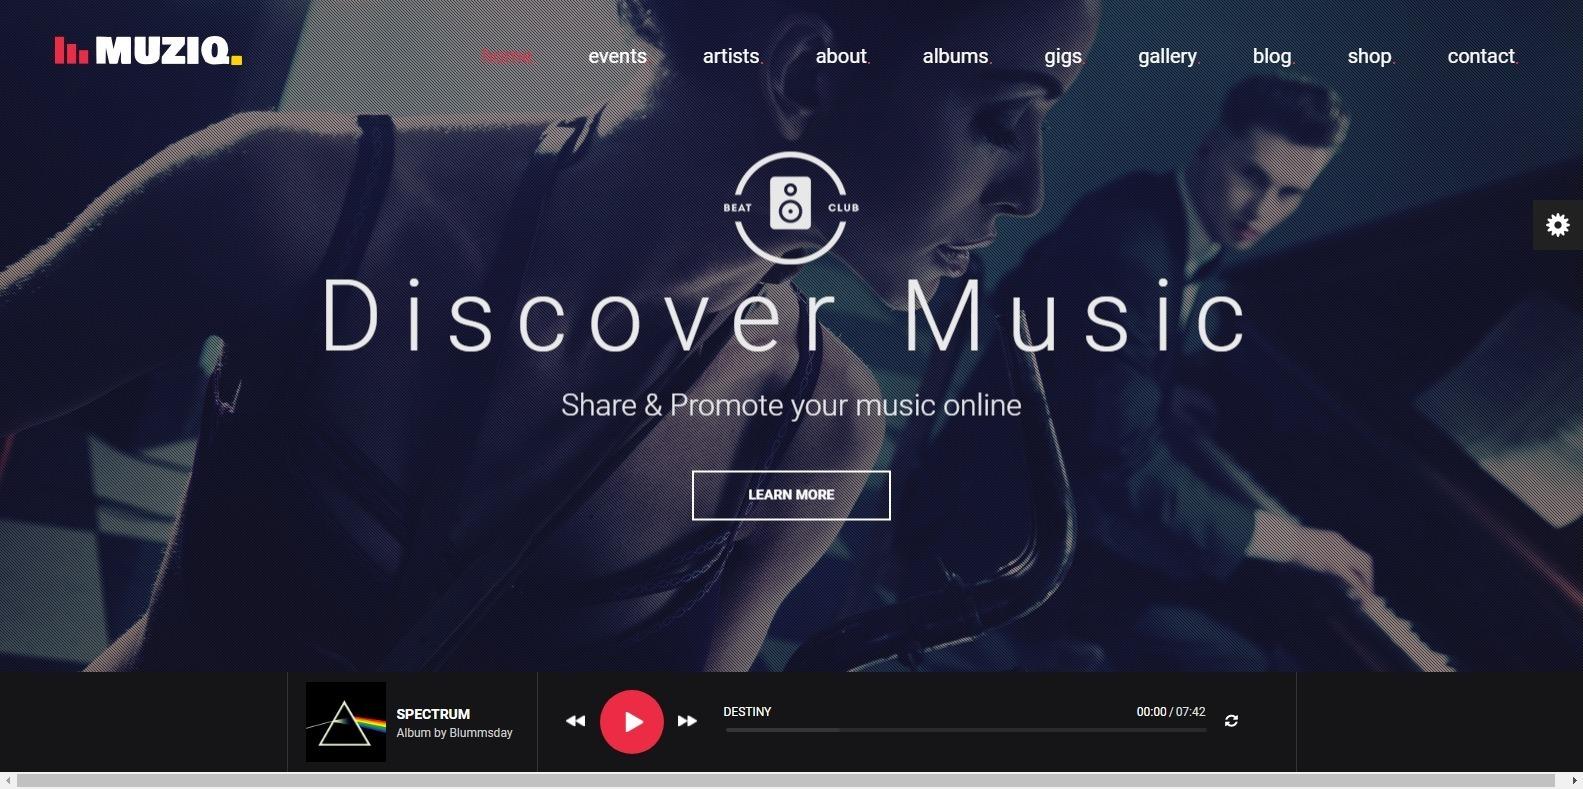 muziq-dj-website-template